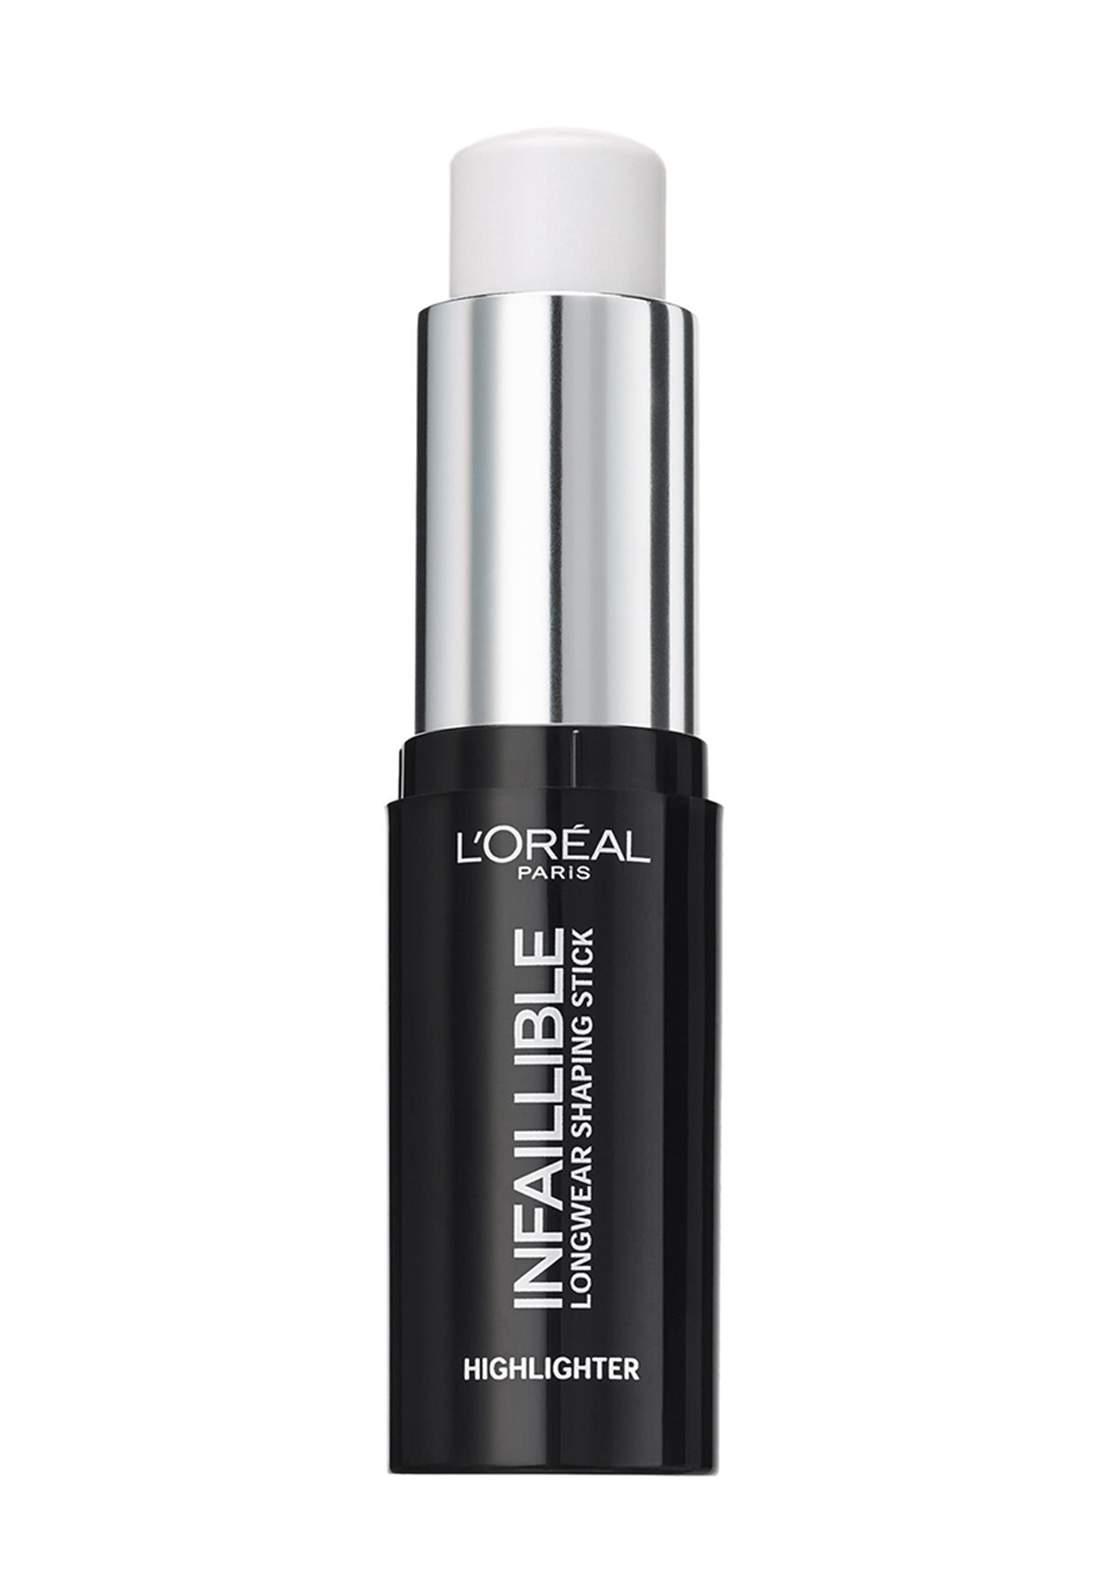 L'Oreal Paris Infallible Stobe Highlight Stick 500 Frozen (027-1060) اضاءة كريمية للوجه